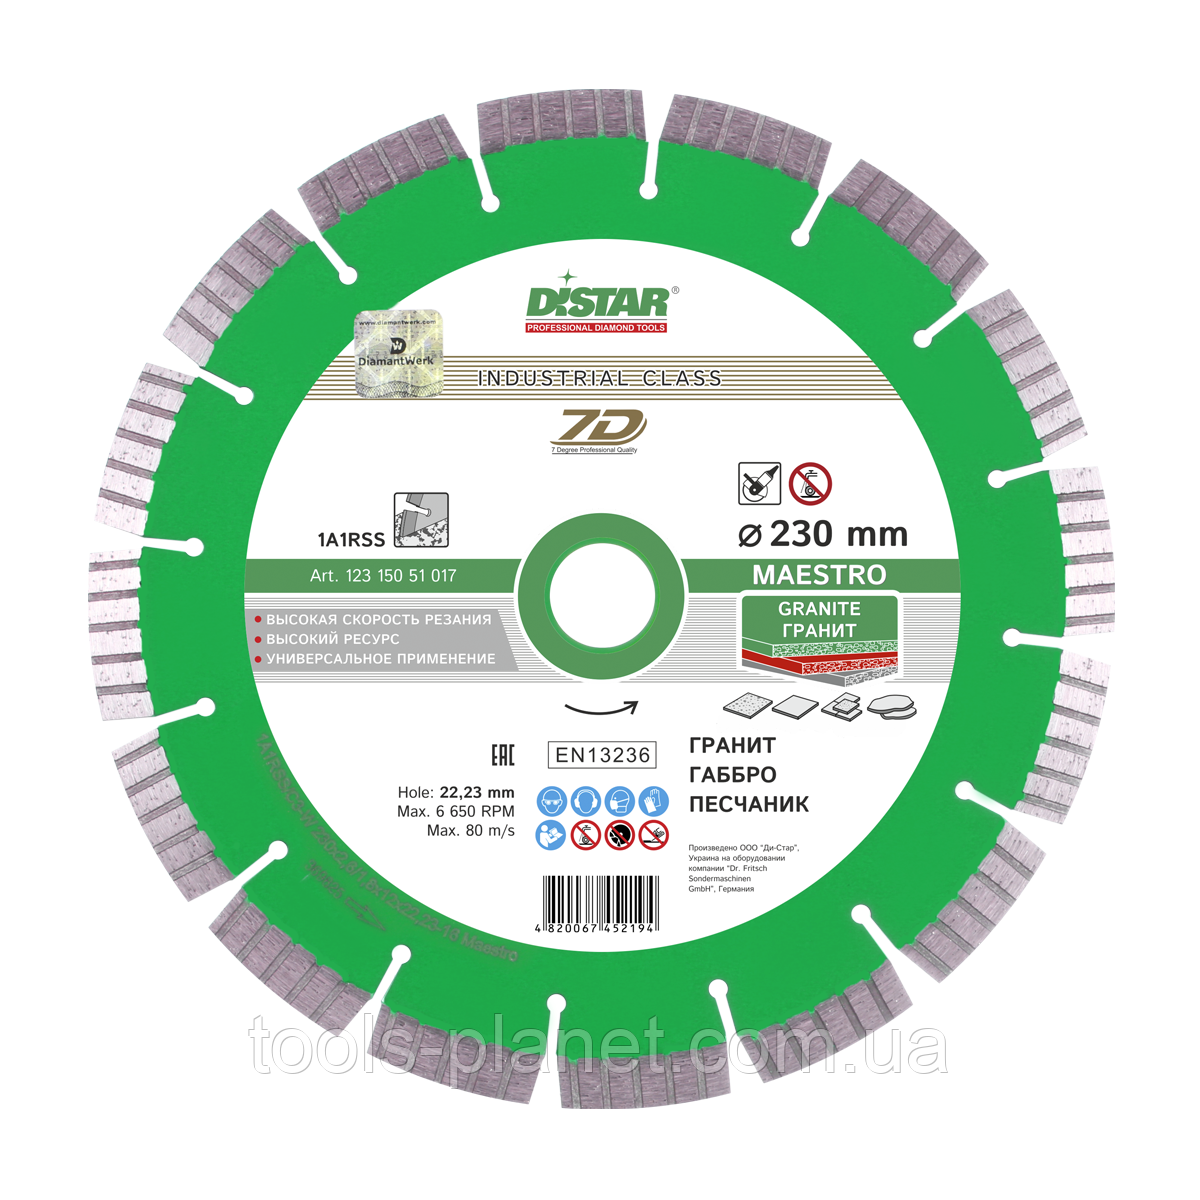 Алмазный диск Distar 1A1RSS/C3 230 x 2,6 x 12 x 22,23 Maestro 7D (12315051017)